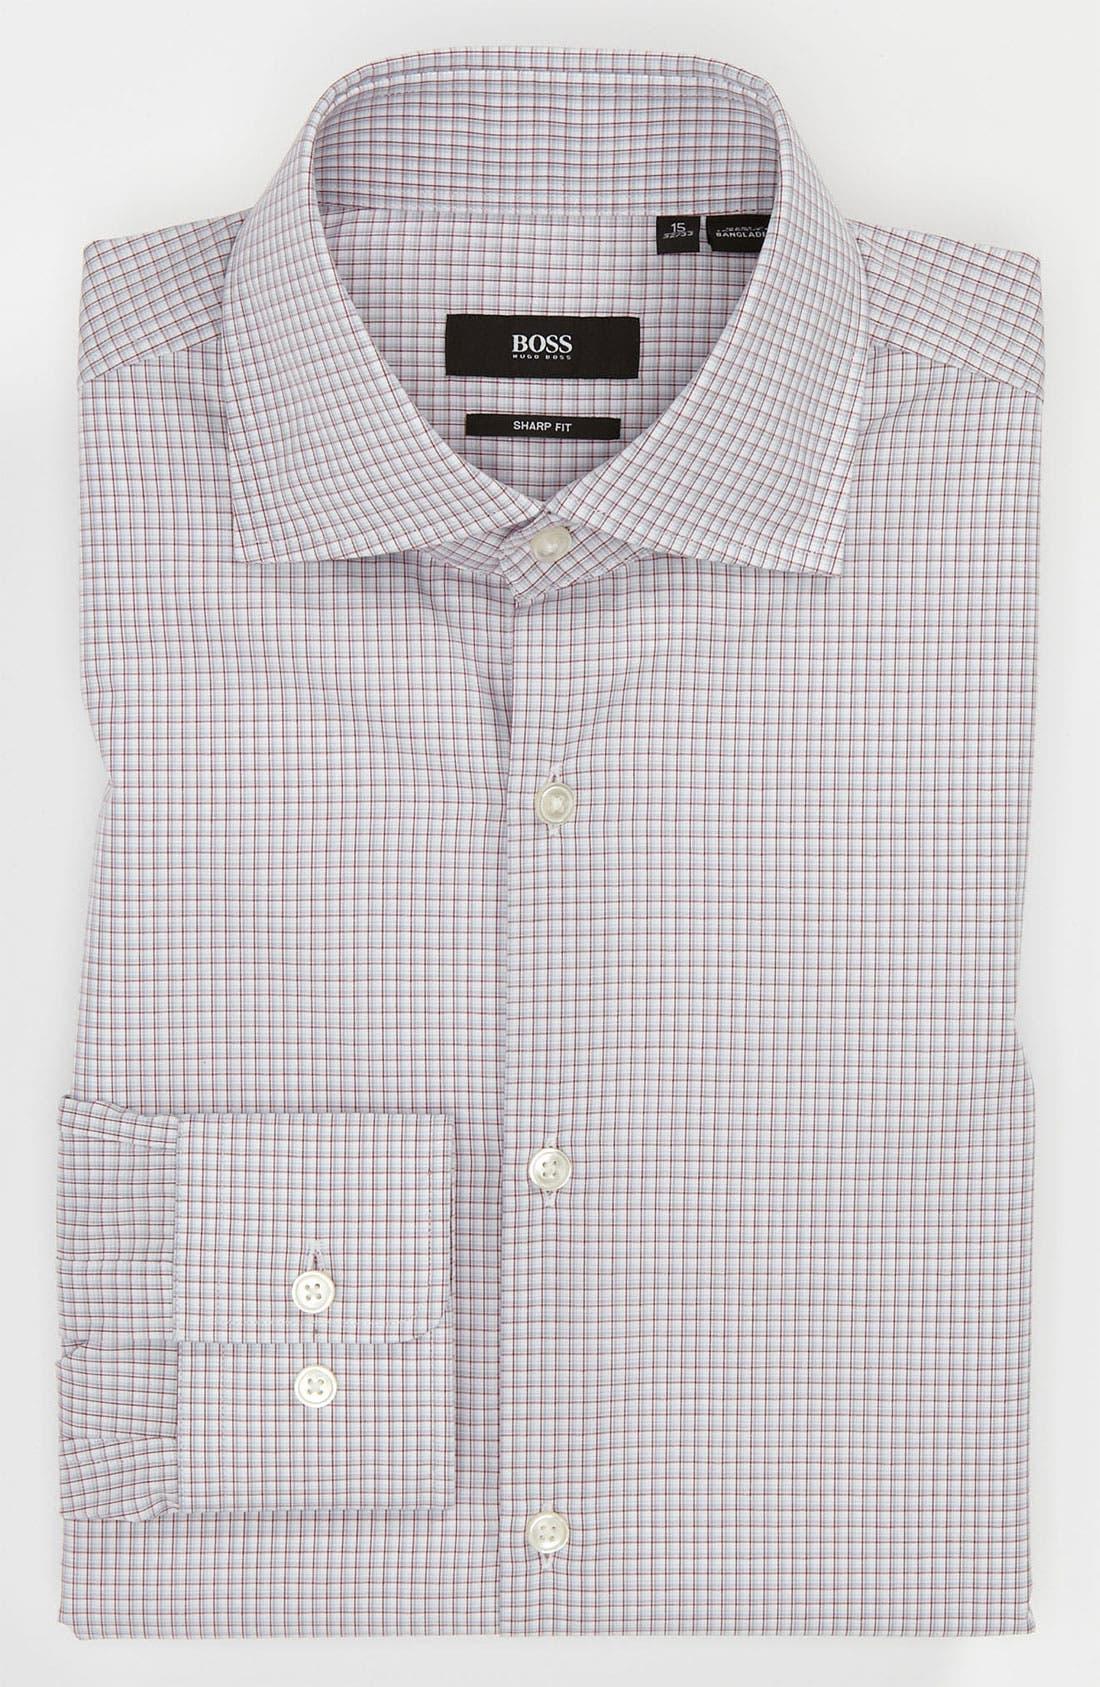 Alternate Image 1 Selected - BOSS Black Sharp Fit Dress Shirt (Online Only)